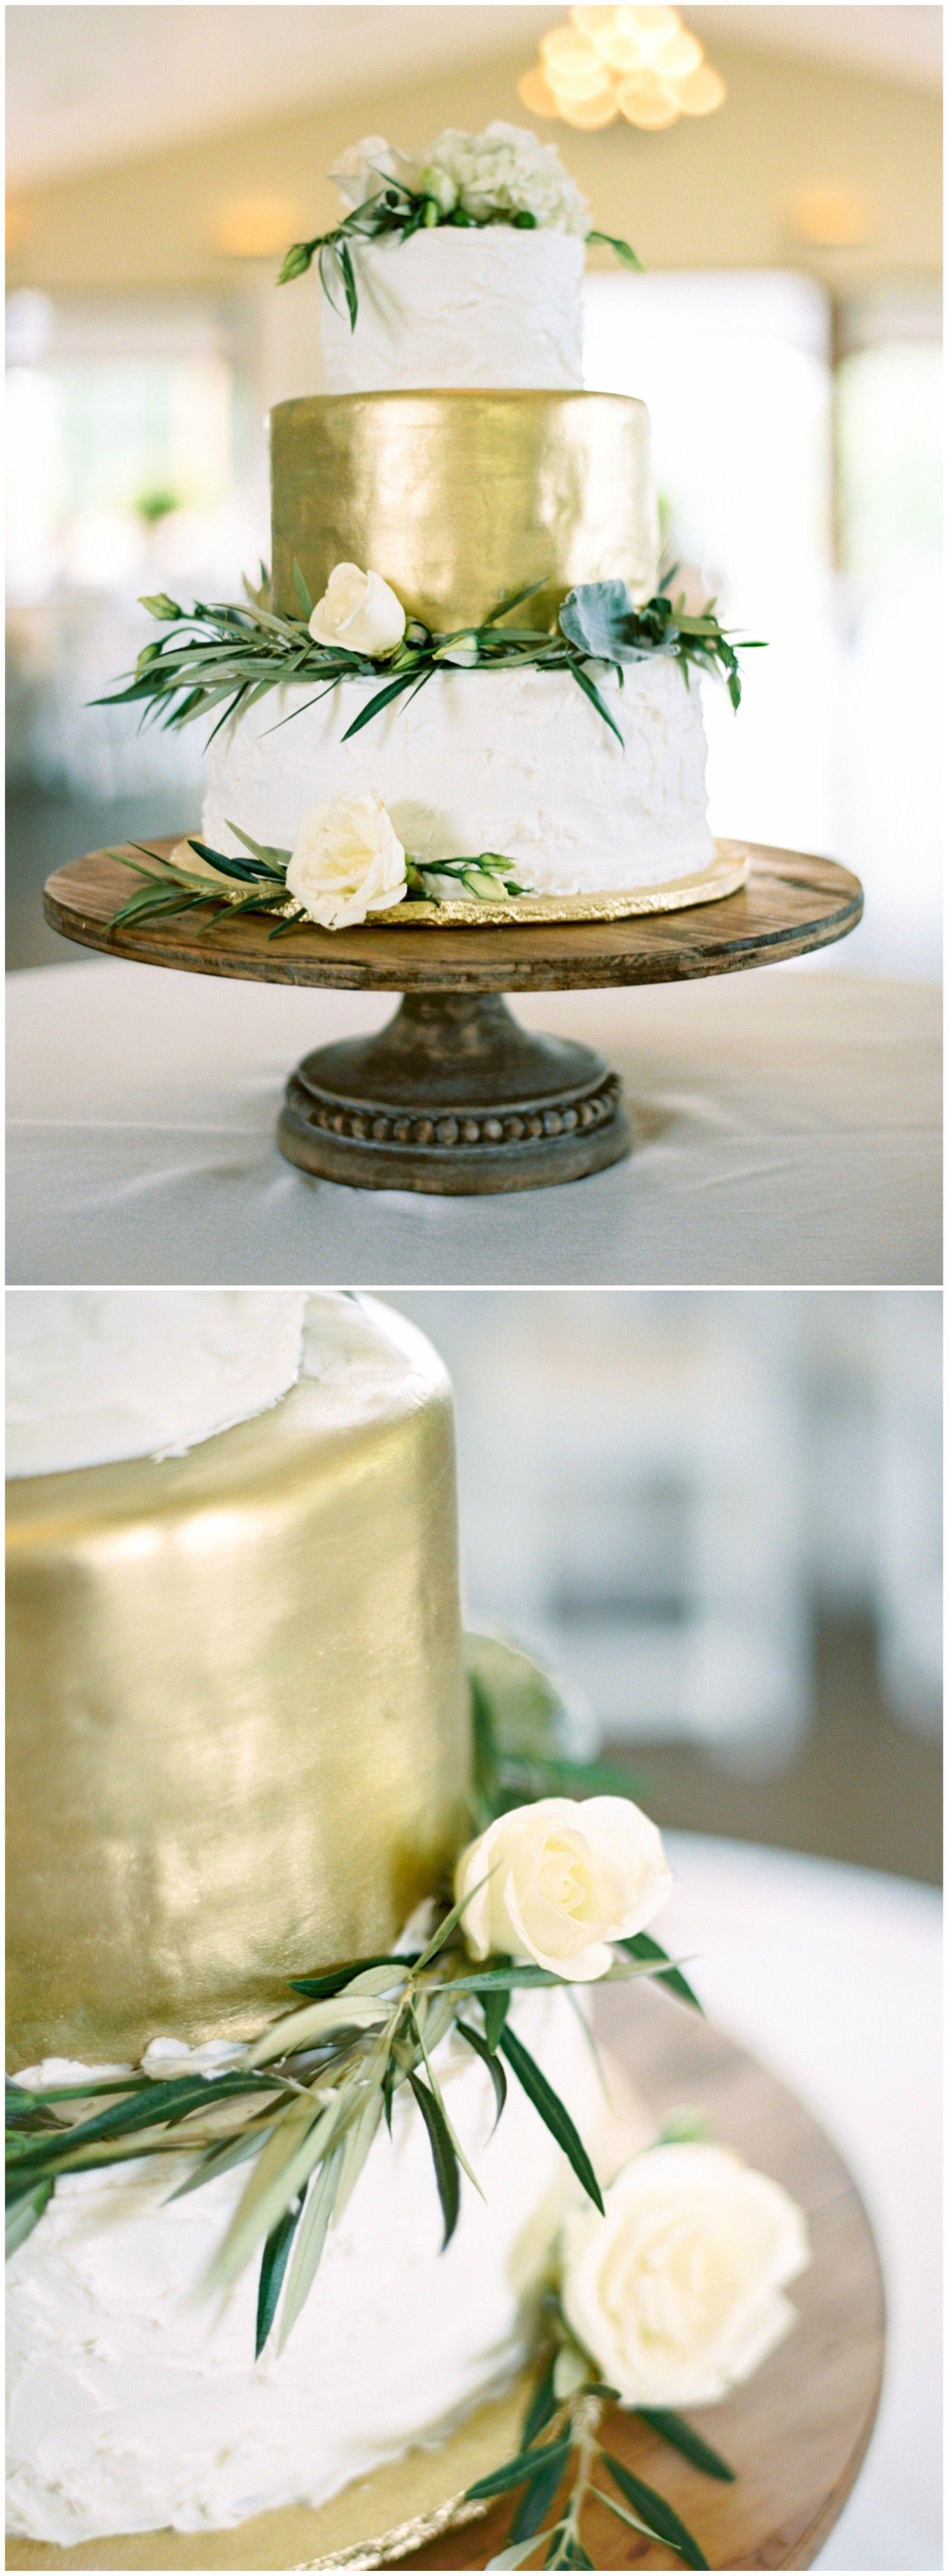 Elegant white and gold wedding cake white floral cake